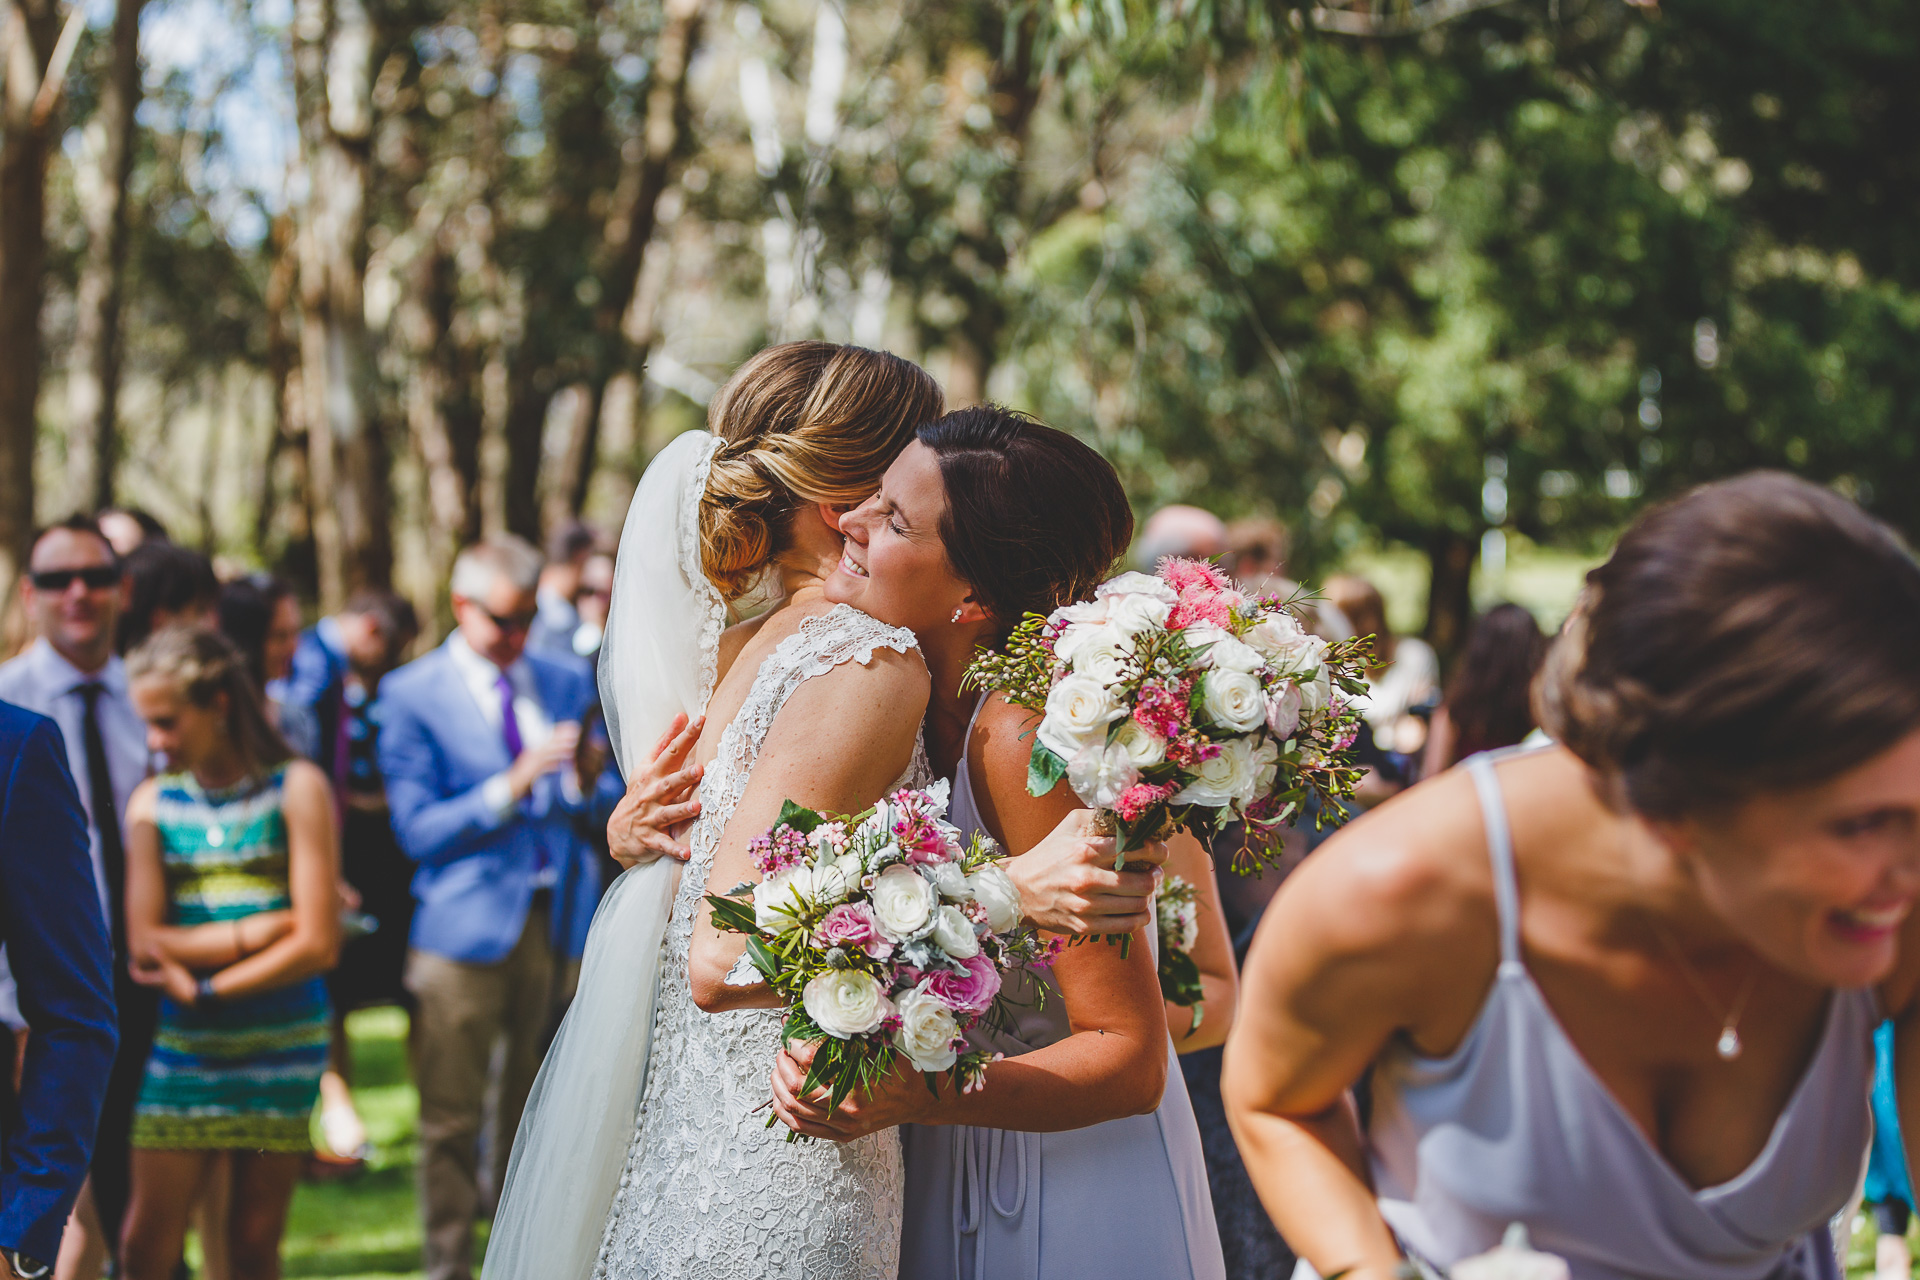 20161112 - Heath_Ruth_Wombat_Hollow_Wedding | 240.jpg